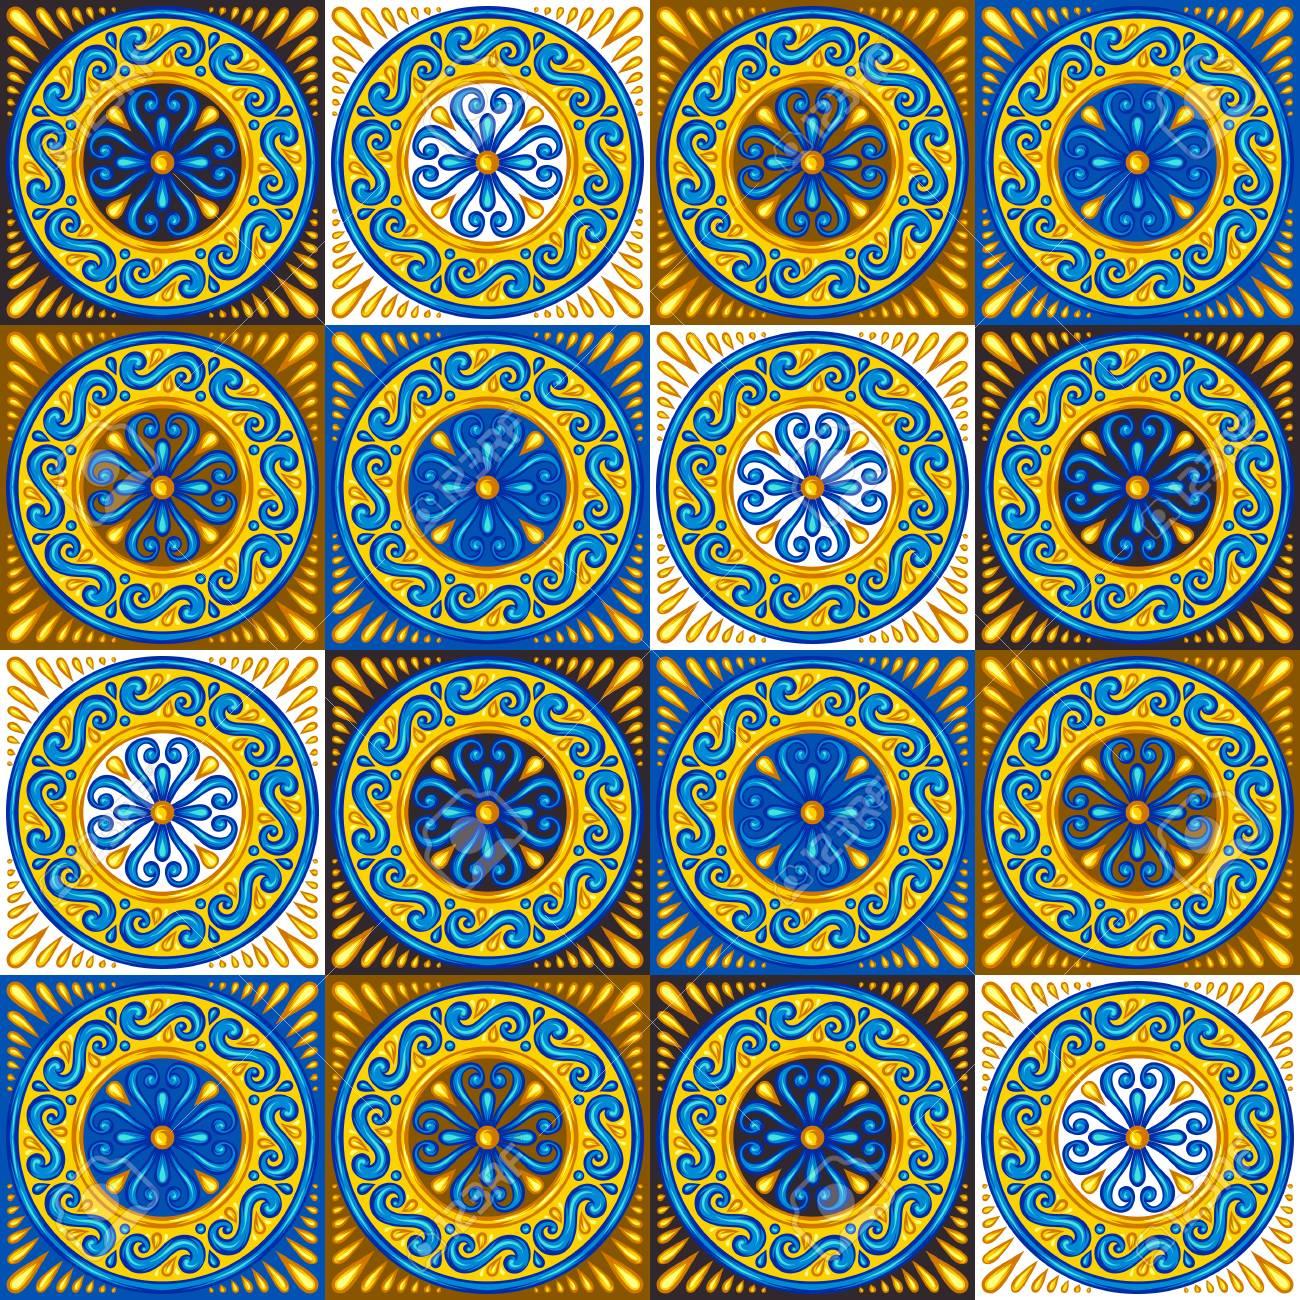 Moroccan ceramic tile seamless pattern. Ethnic floral motifs. Mediterranean traditional folk ornament. Portuguese azulejo, mexican talavera or spanish majolica. - 121747490